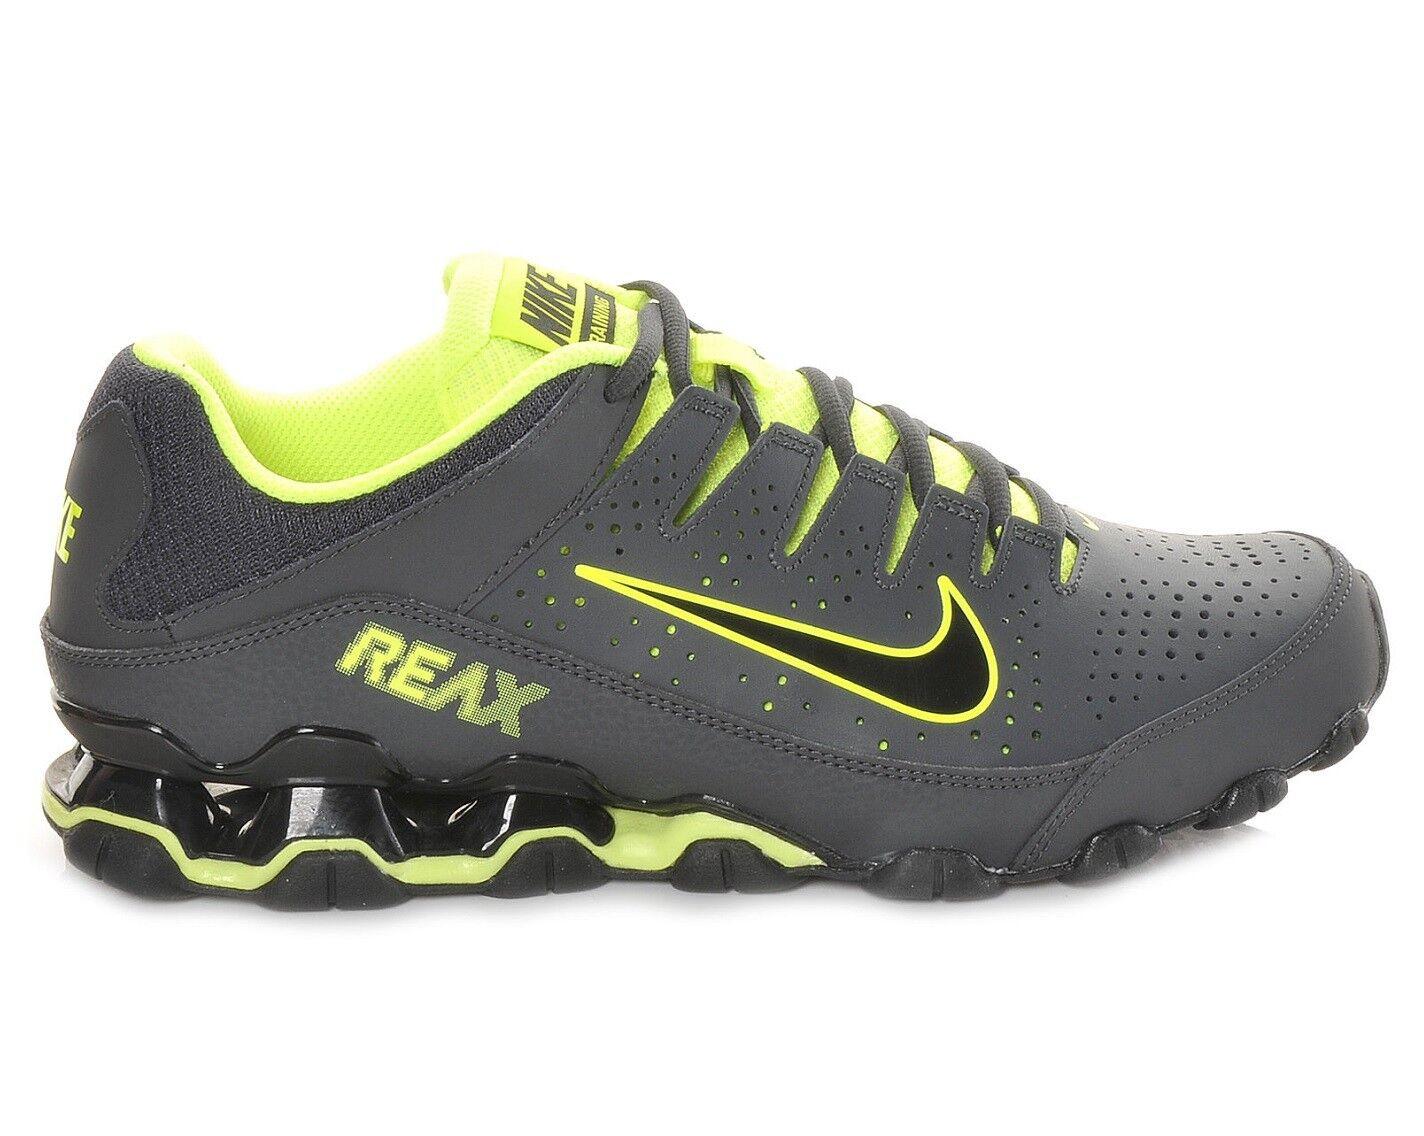 Nike Reax 8 TR Mens 616272-036 Anthracite Black Volt Training shoes Size 11